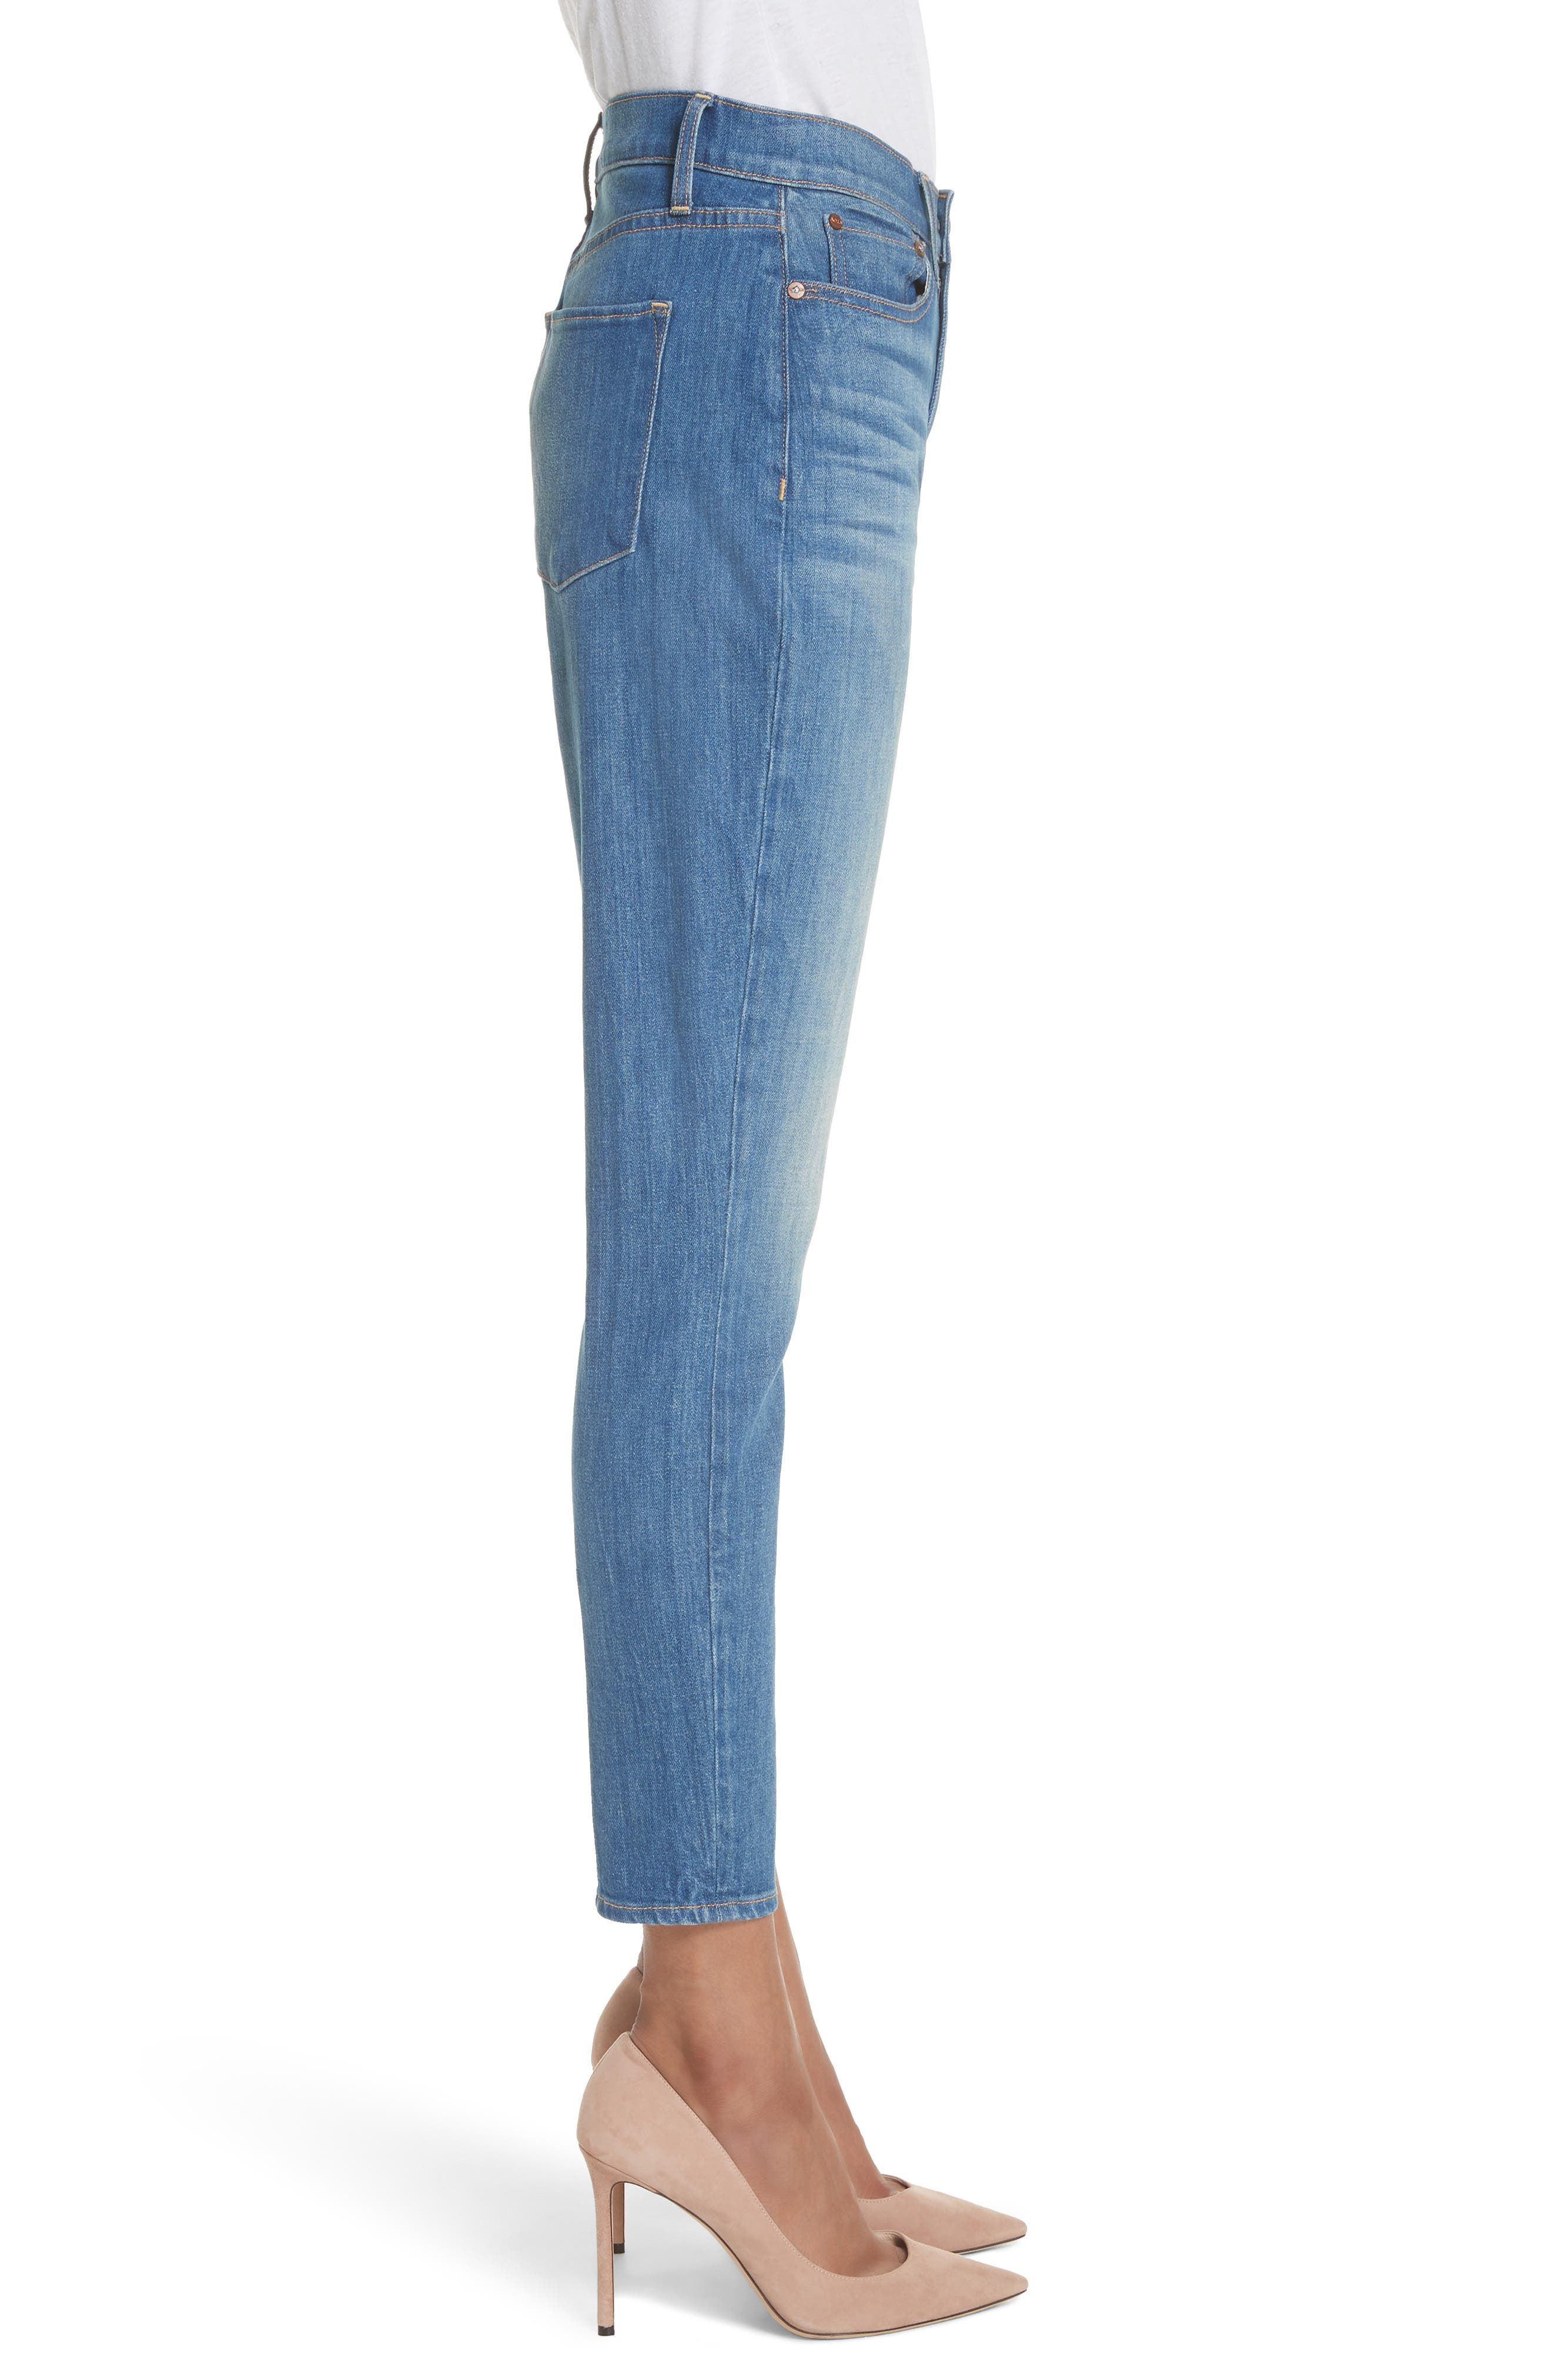 AO.LA Good High Waist Ankle Skinny Jeans,                             Alternate thumbnail 3, color,